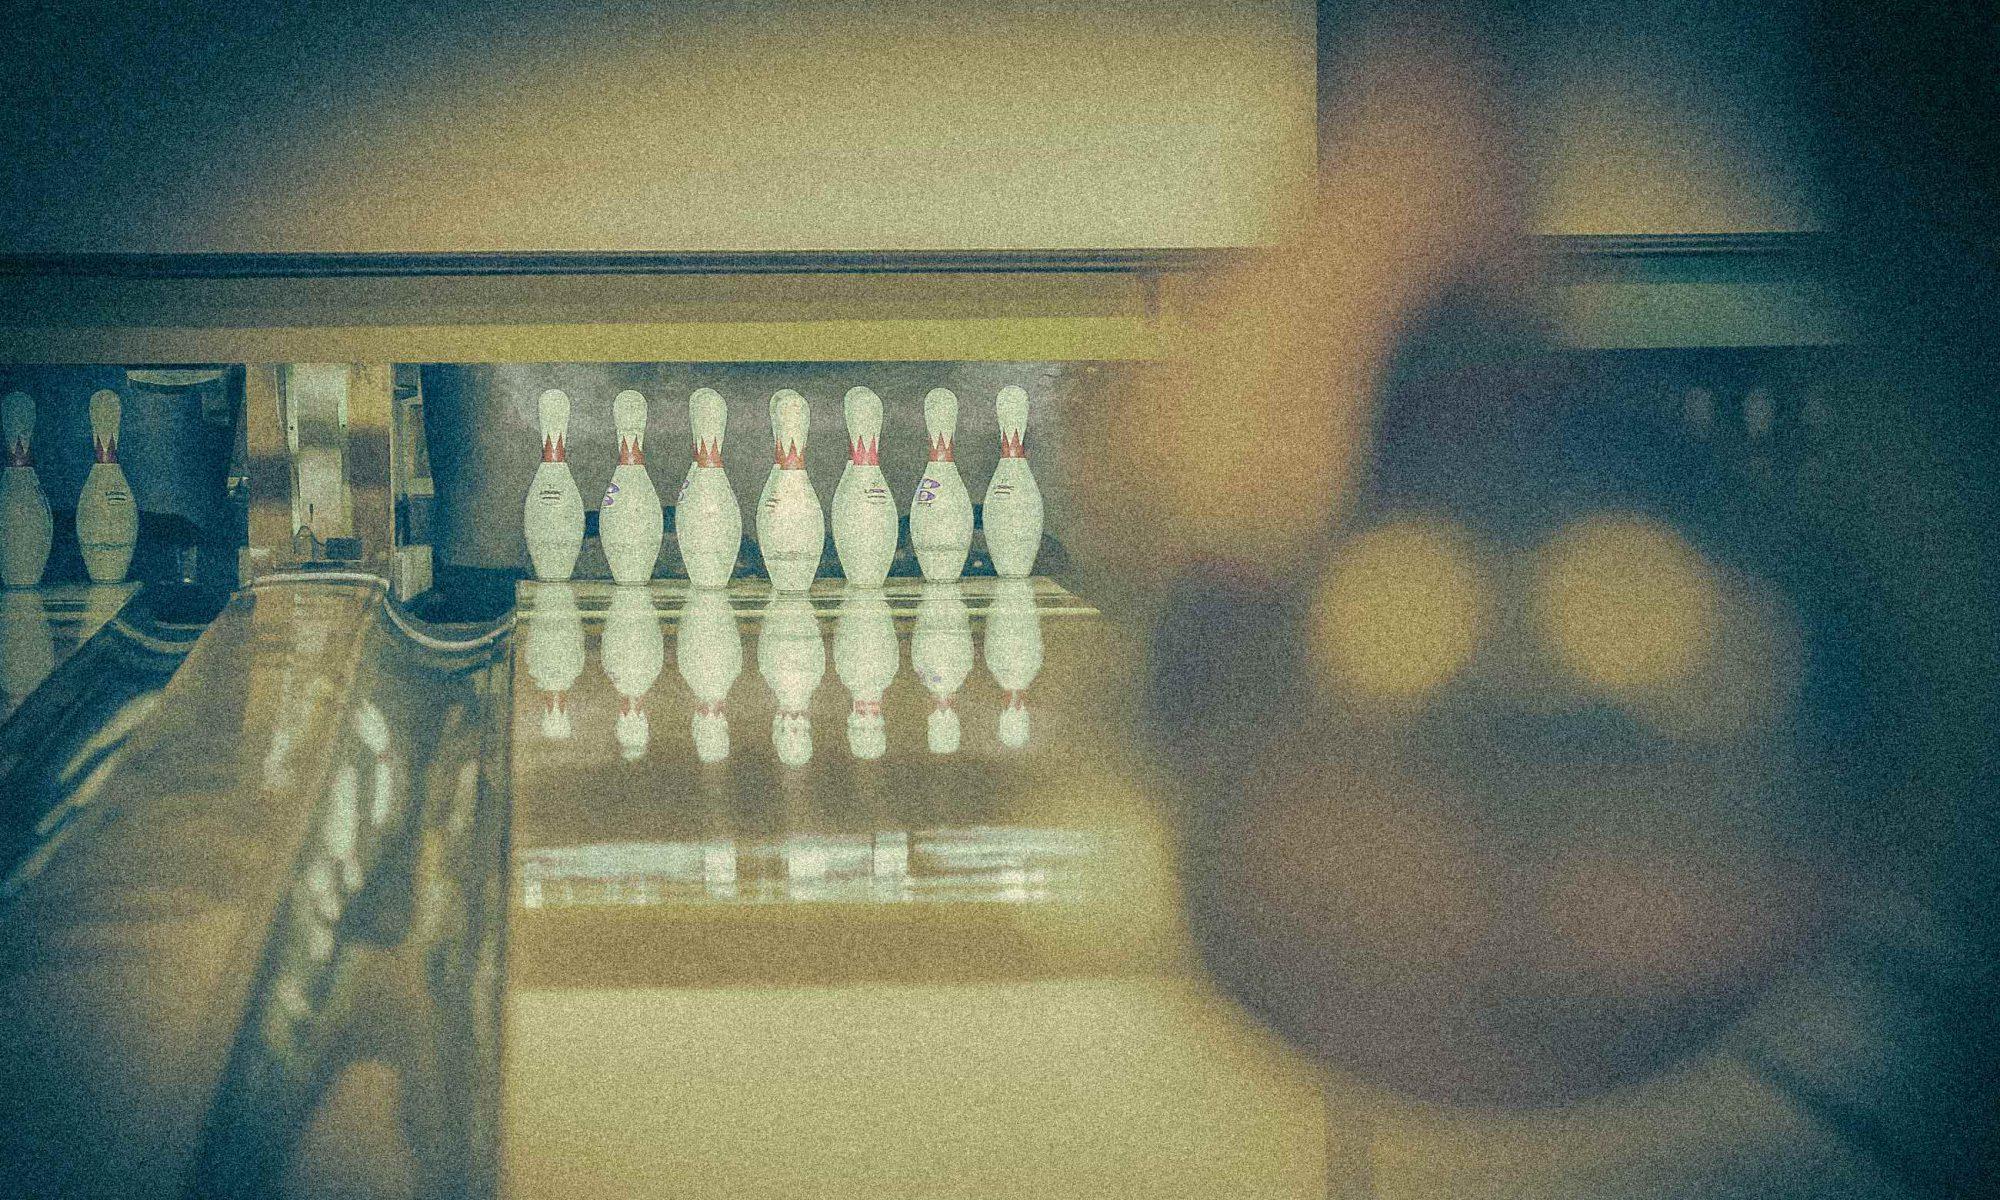 Bowlingcenter Oberberg